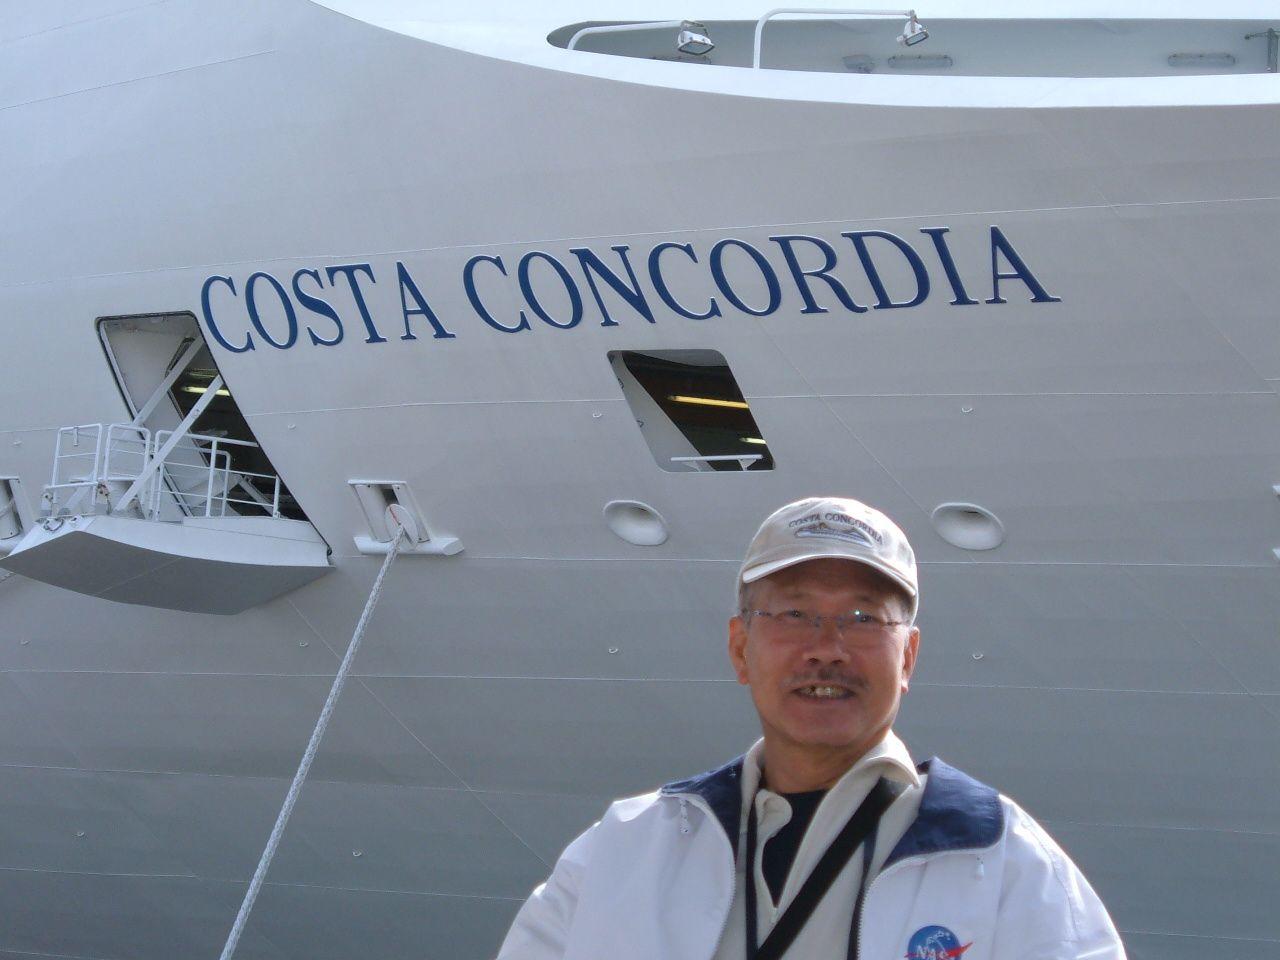 Le Costa Concordia au temps de sa splendeur...